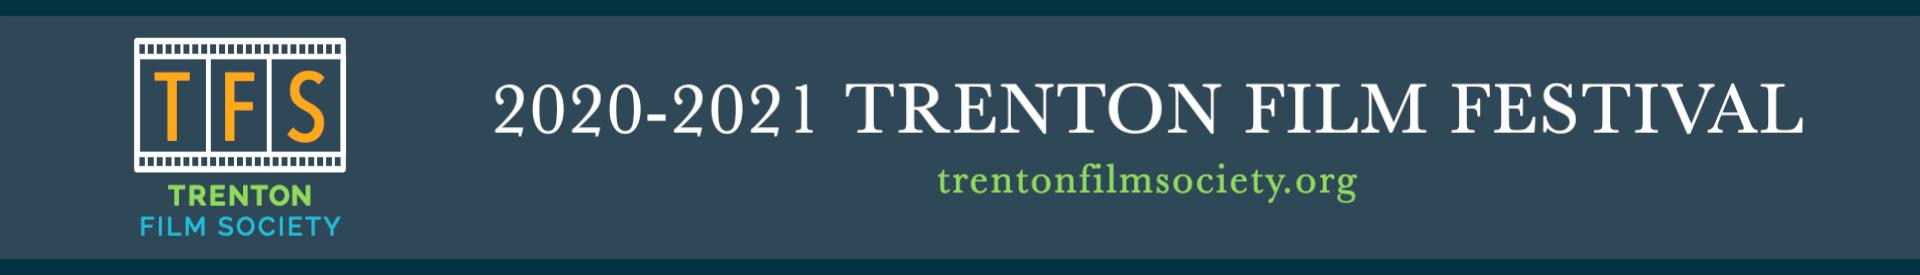 2020-2021 Trenton Film Festival